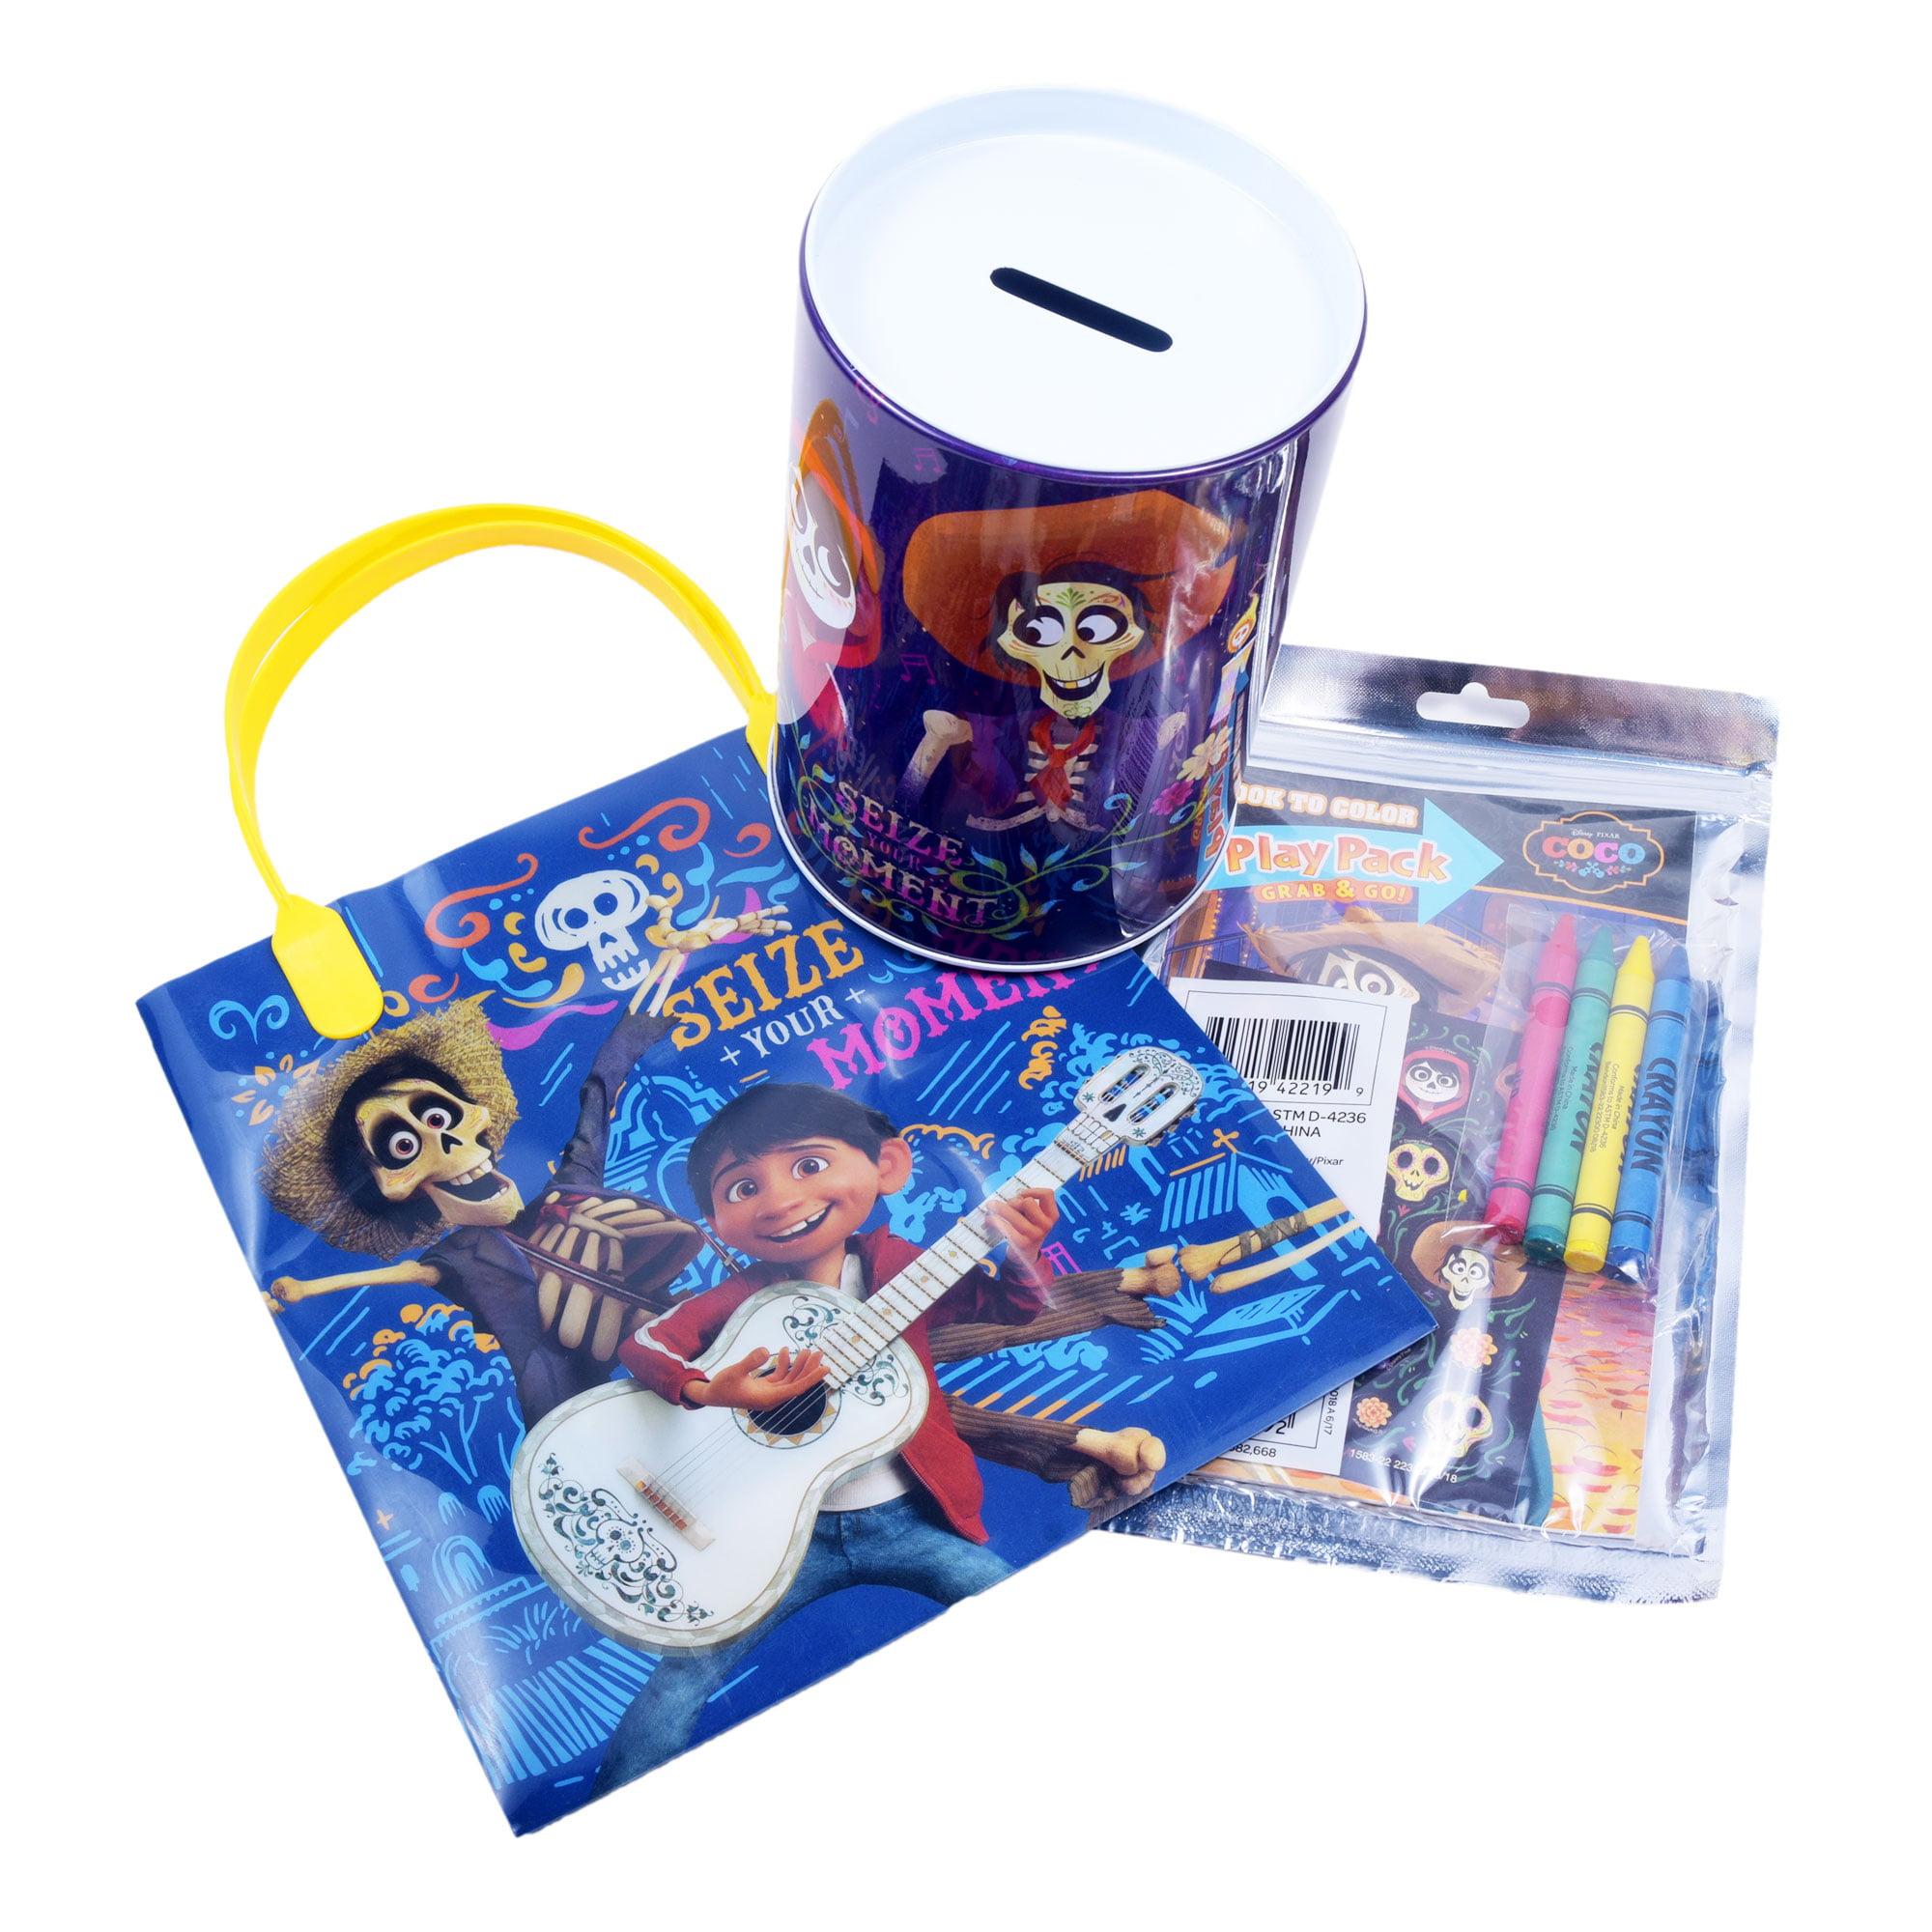 Disney Coco Gift Idea For Boys & Girls (3-pck) Christmas Party Supplies For  Kids Ages 3+ / Coin Jar, Coloring Book & Bag - Walmart.com - Walmart.com